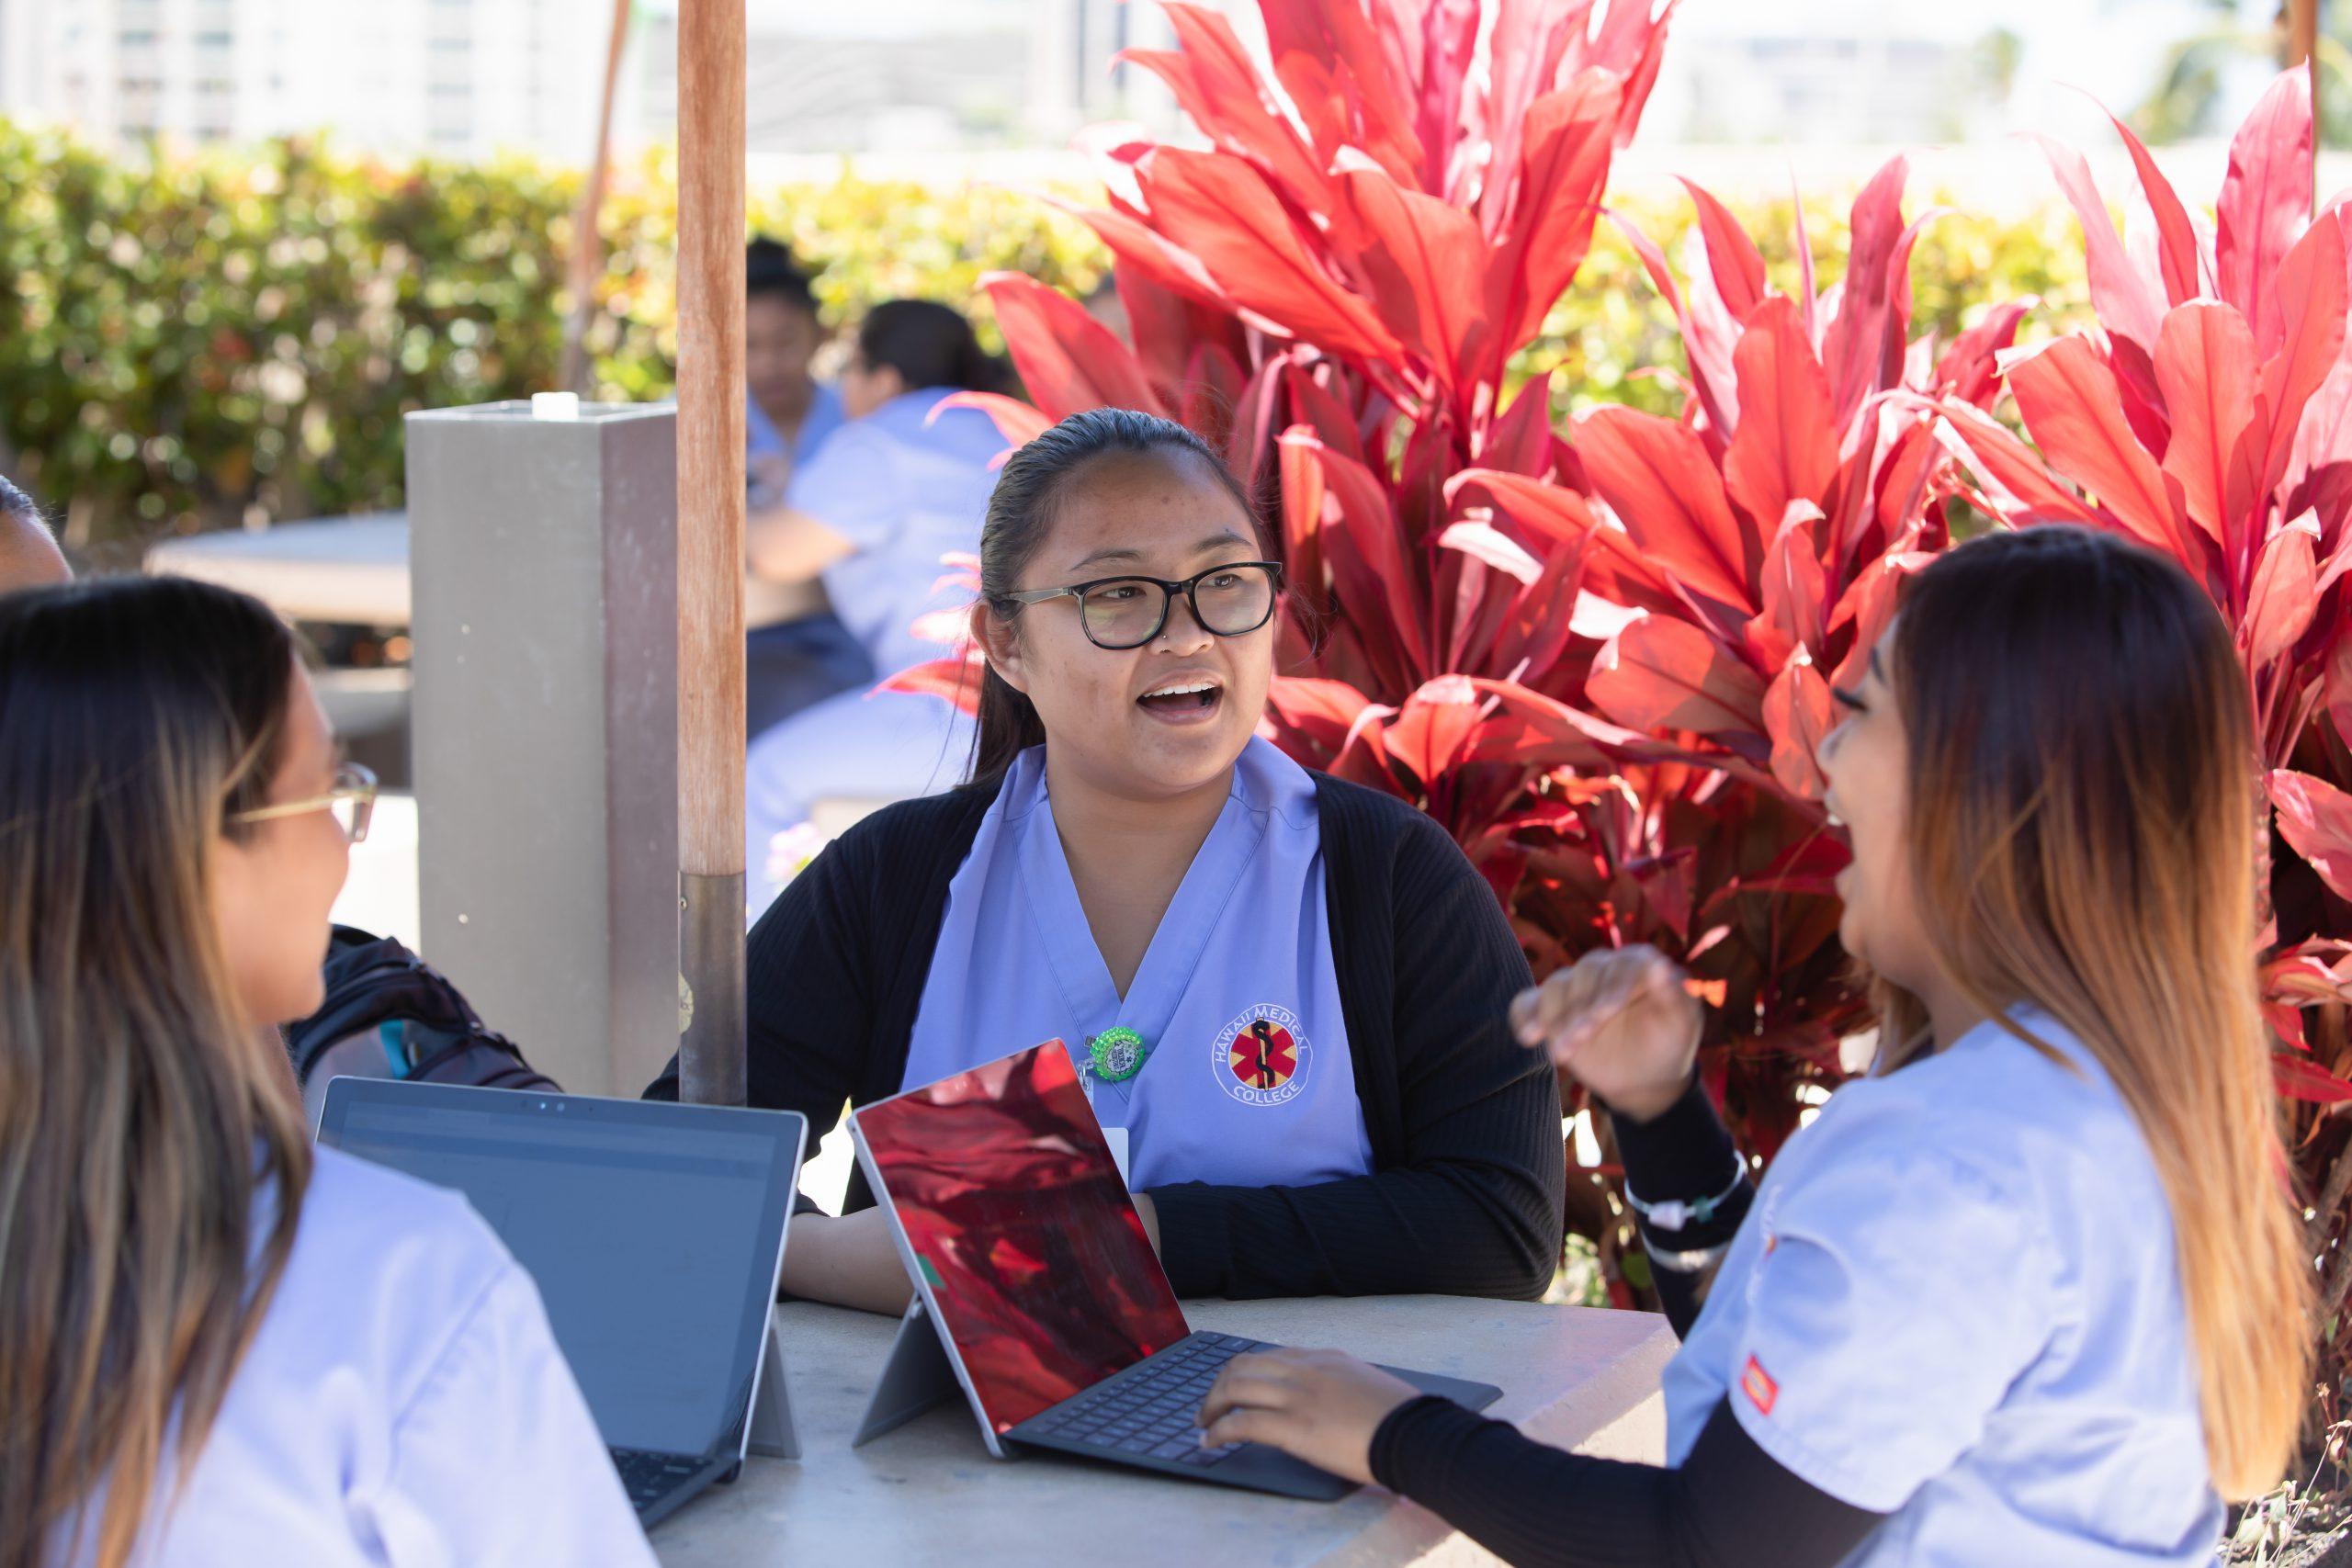 Hawaii Medical College Student Photos